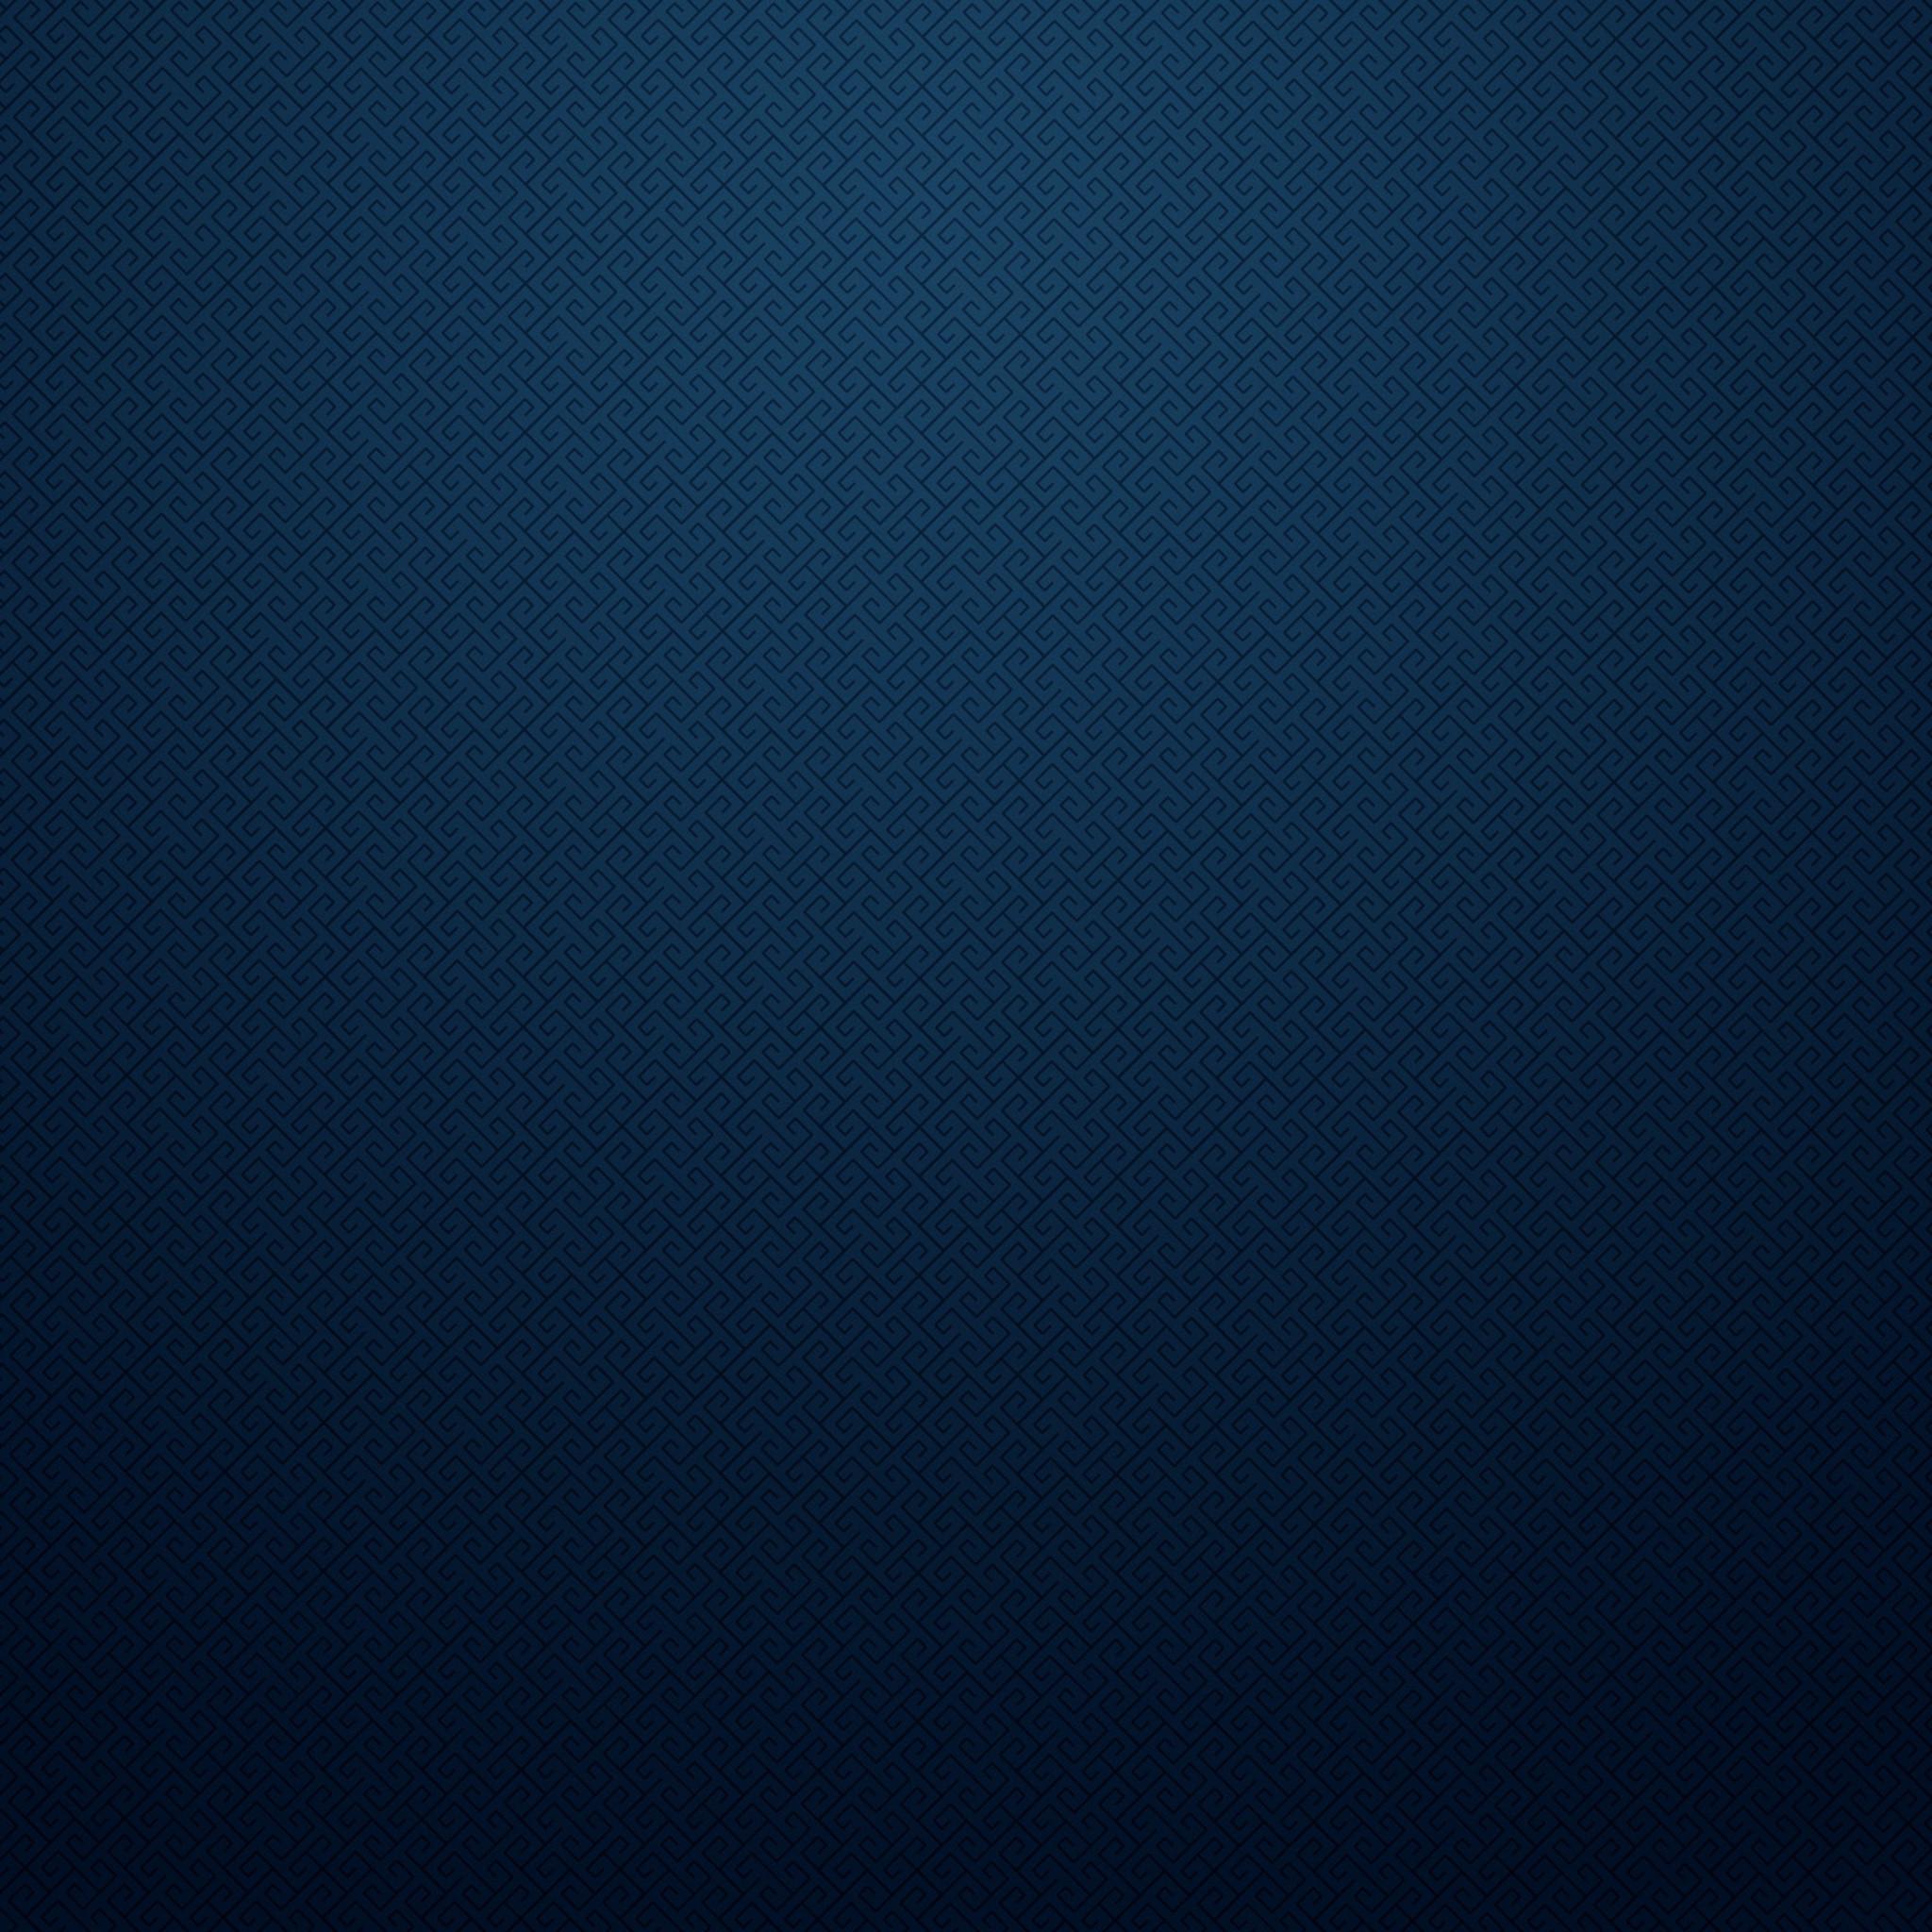 Cloudy Sky Gradient Dark Blue Background Flickr Dark Blue Background #9033